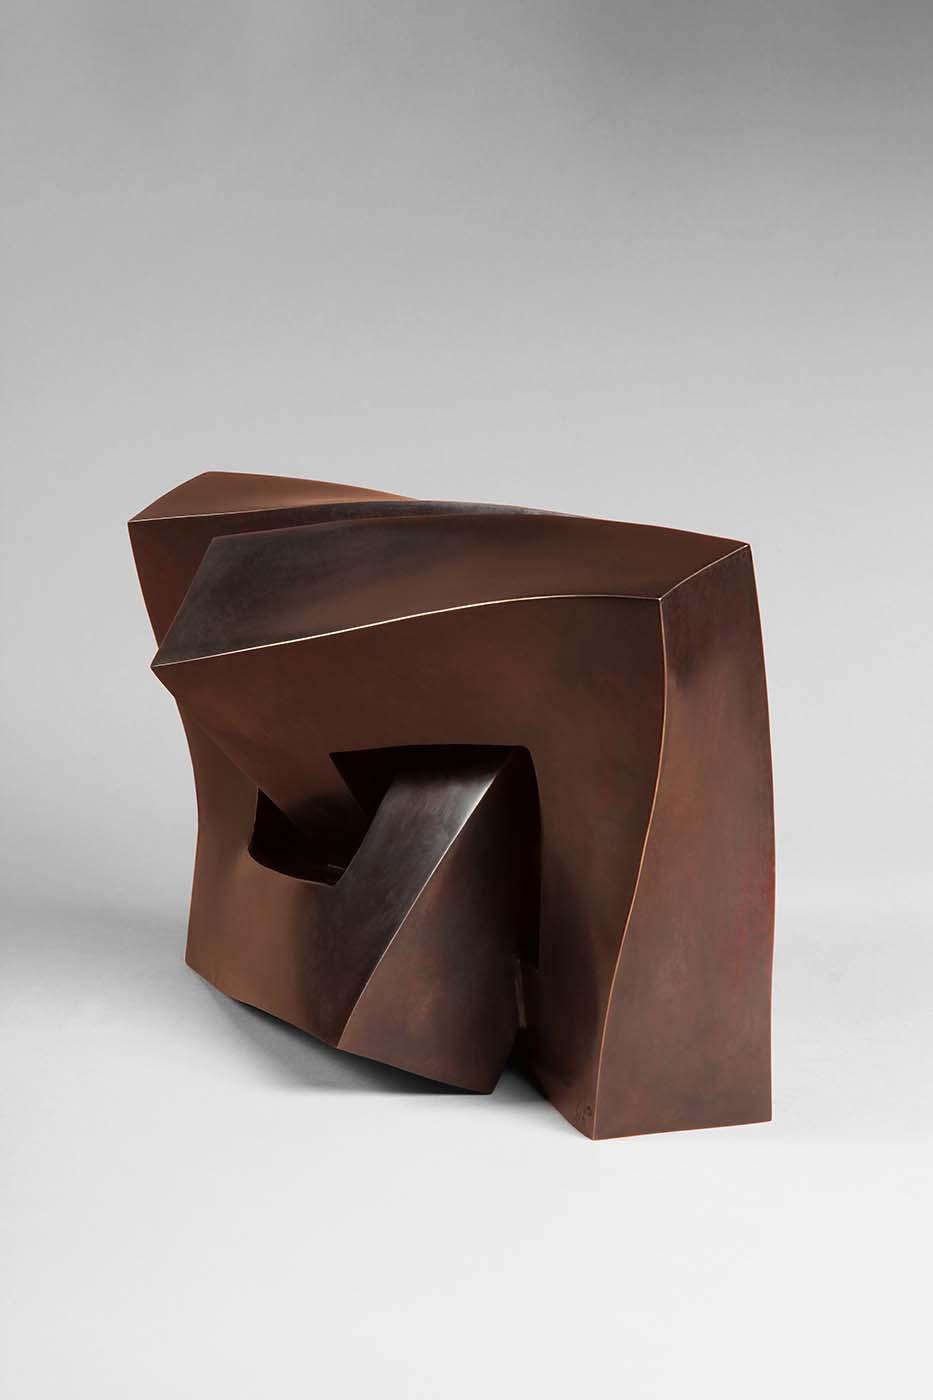 EHE, 2012, 19 x 29 x 15 cm (1)